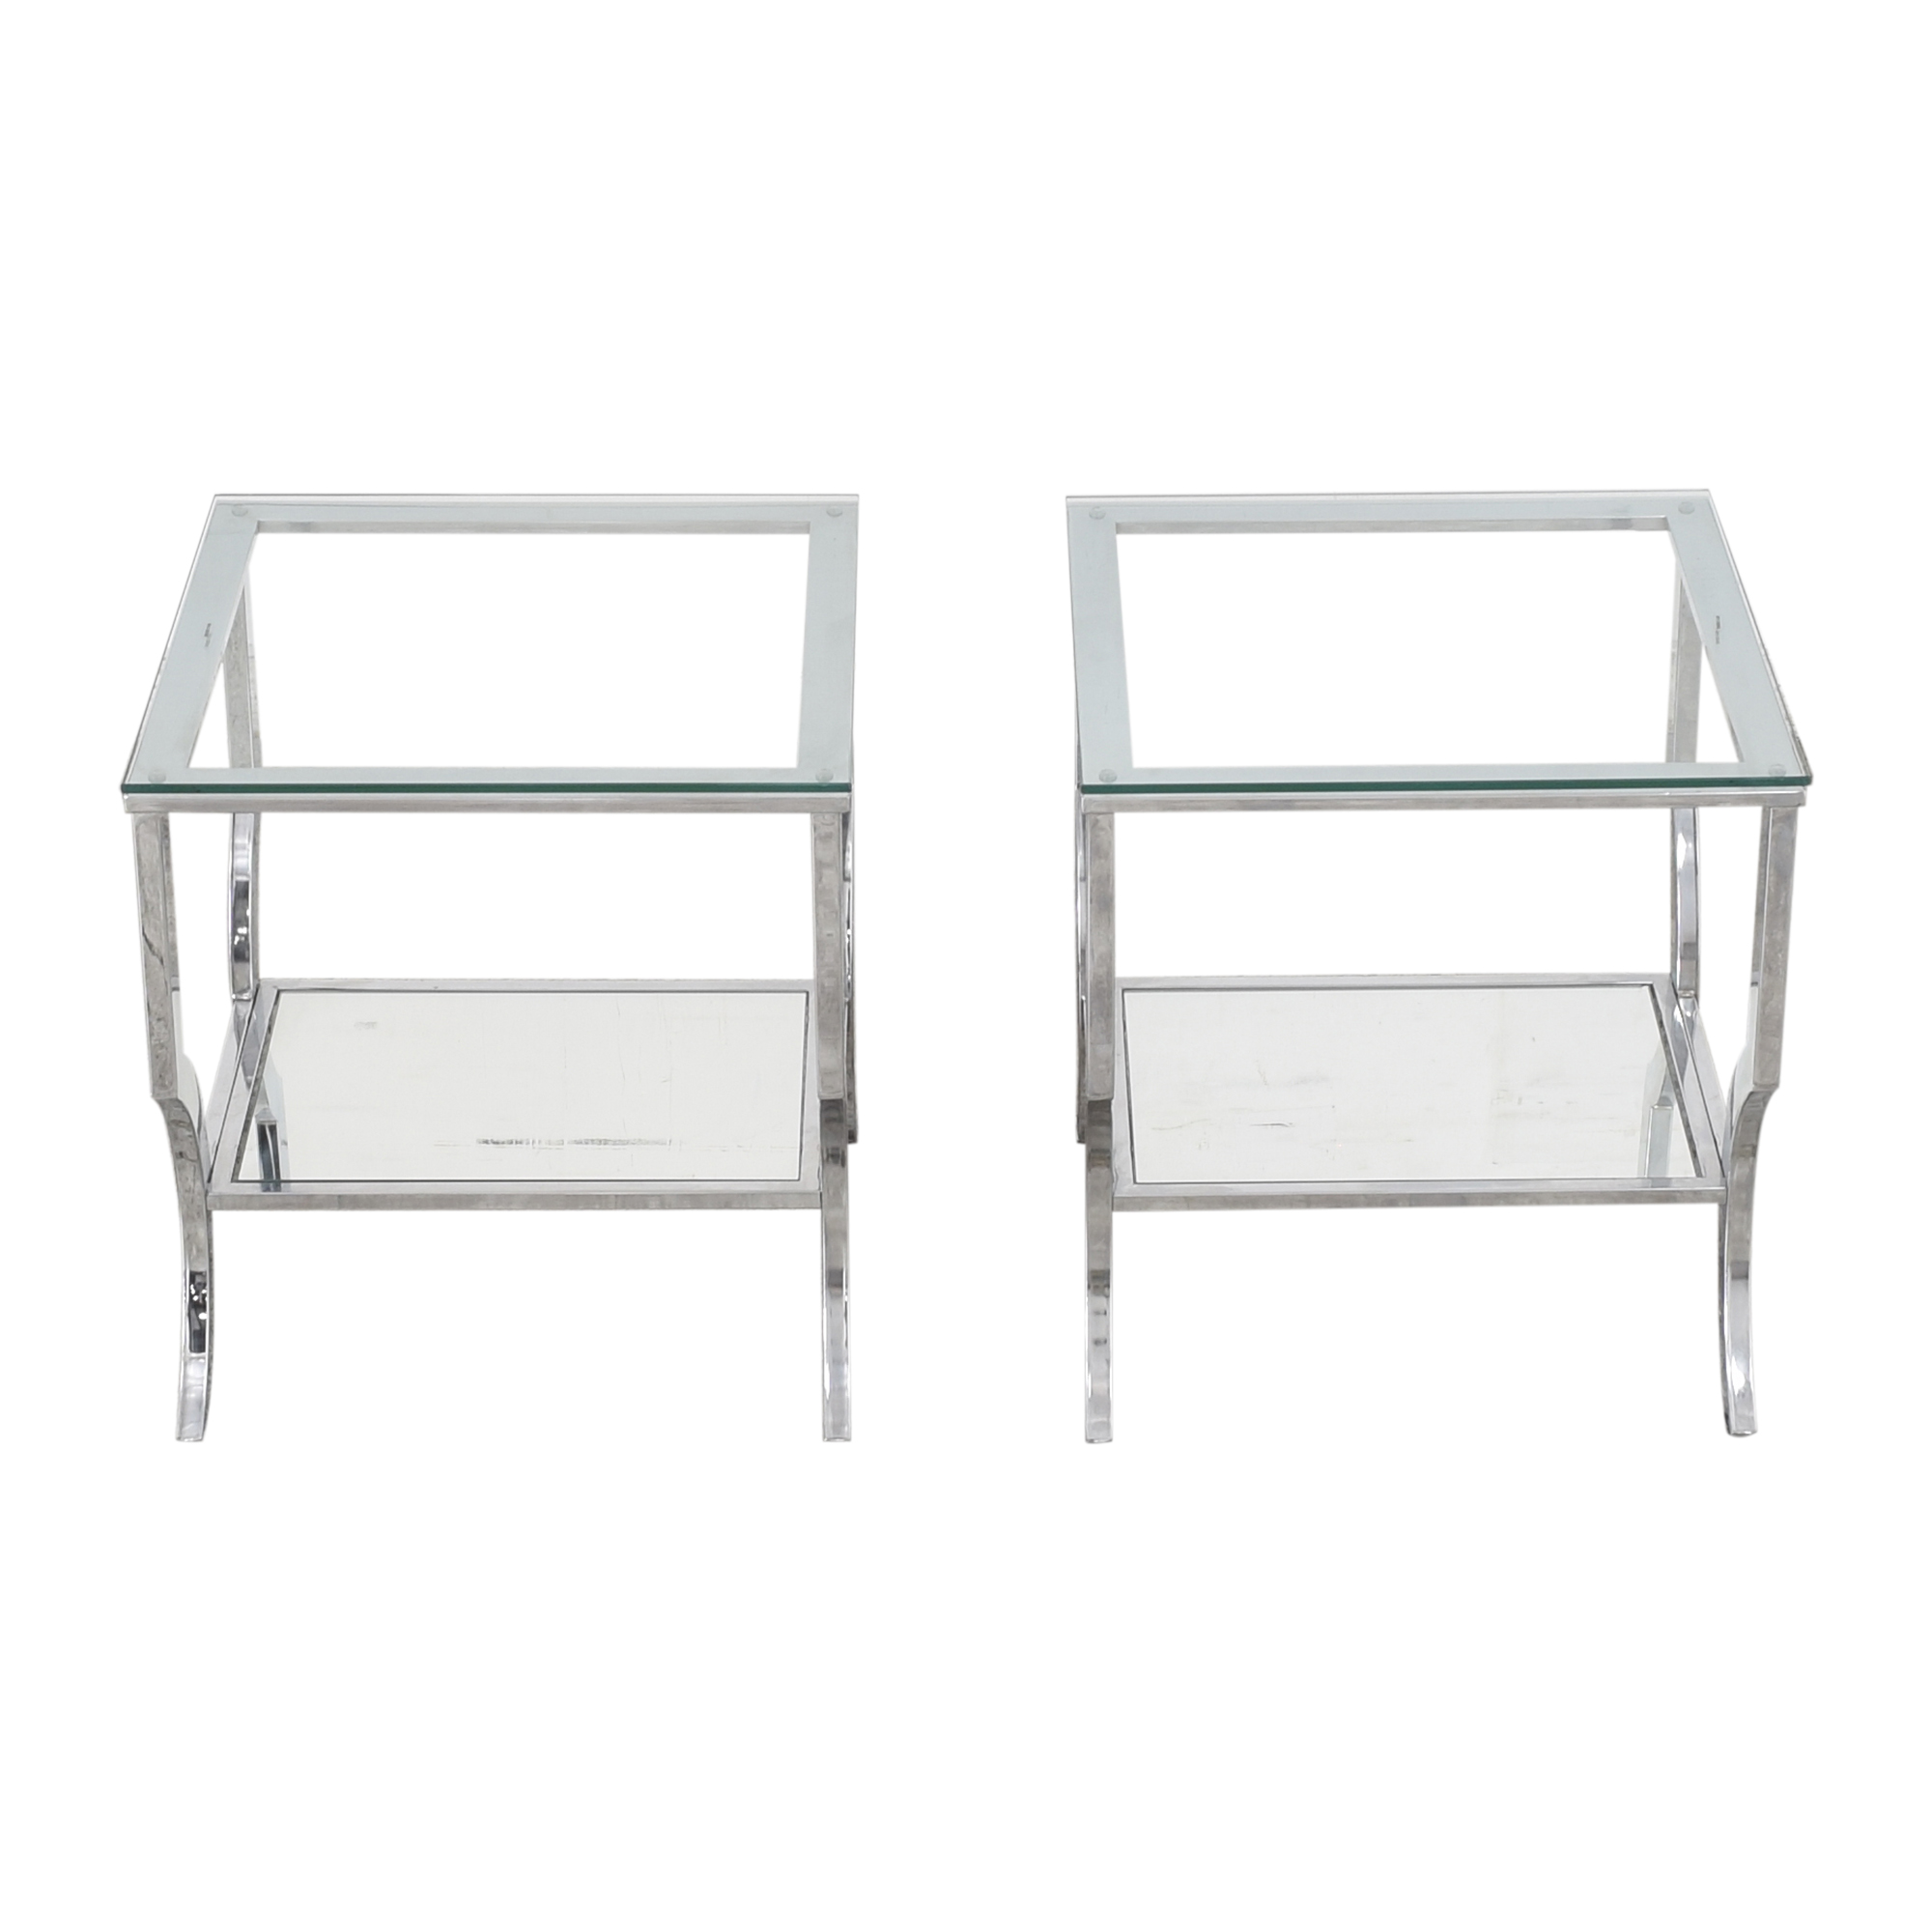 Transparent End Tables for sale